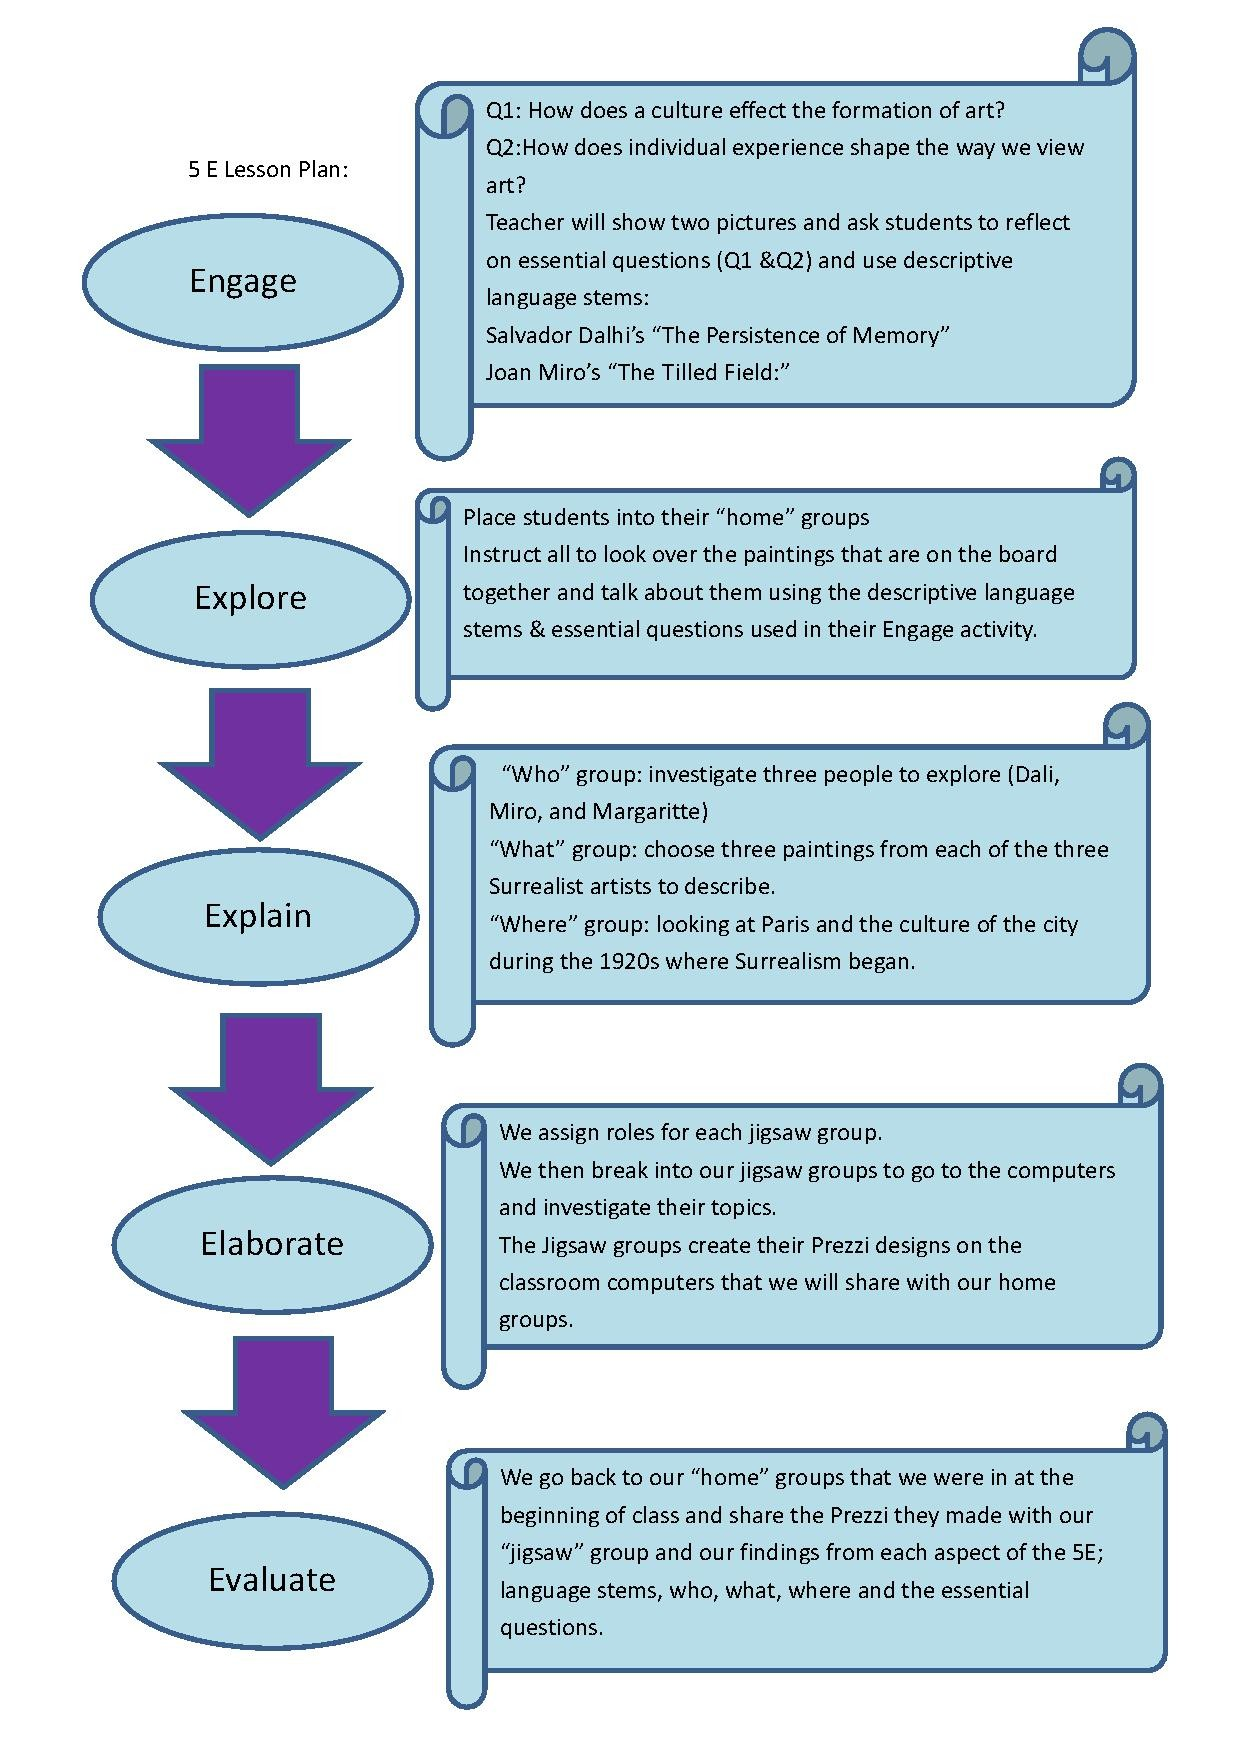 five e lesson plan template  SURREALISM RESOURCES – Art Lesson Plans Blog - five e lesson plan template